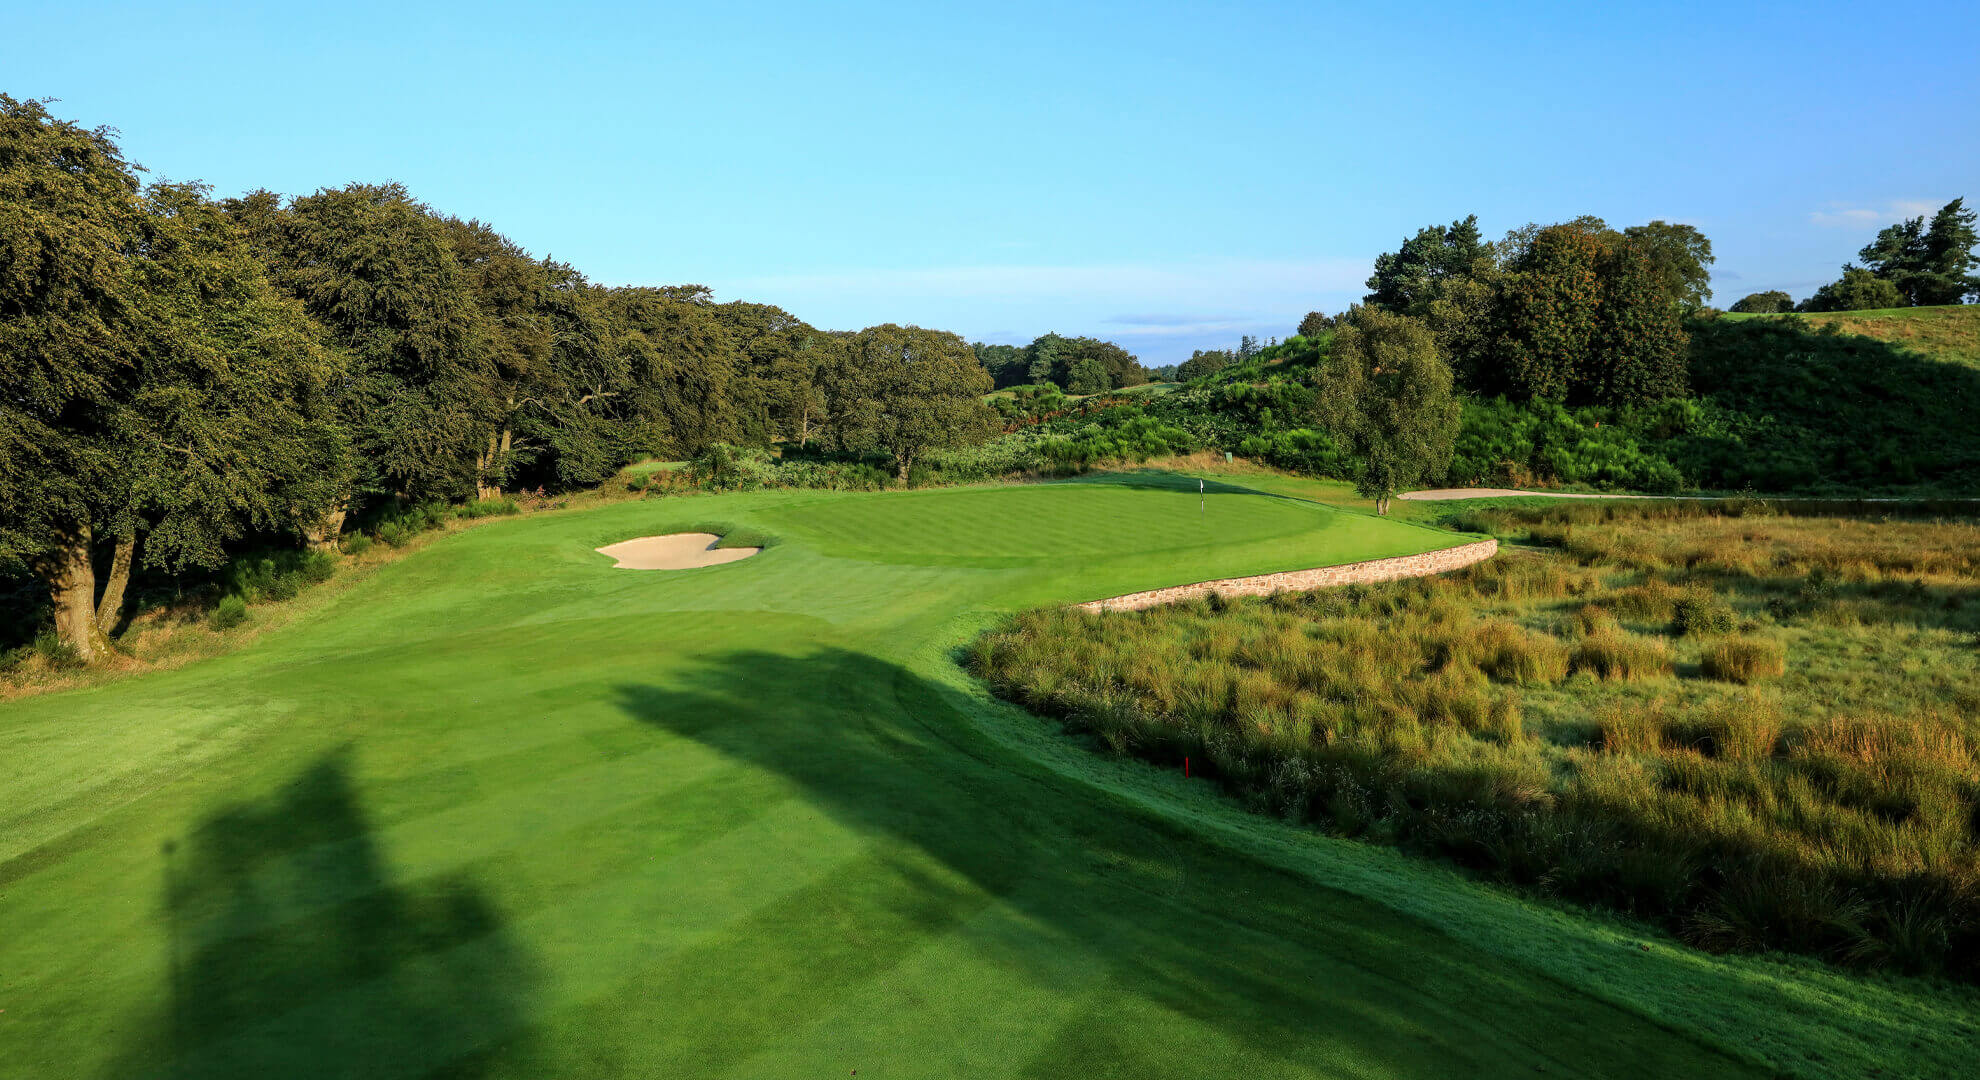 Gleneagles PGA Golf Course, Dundee and Angus